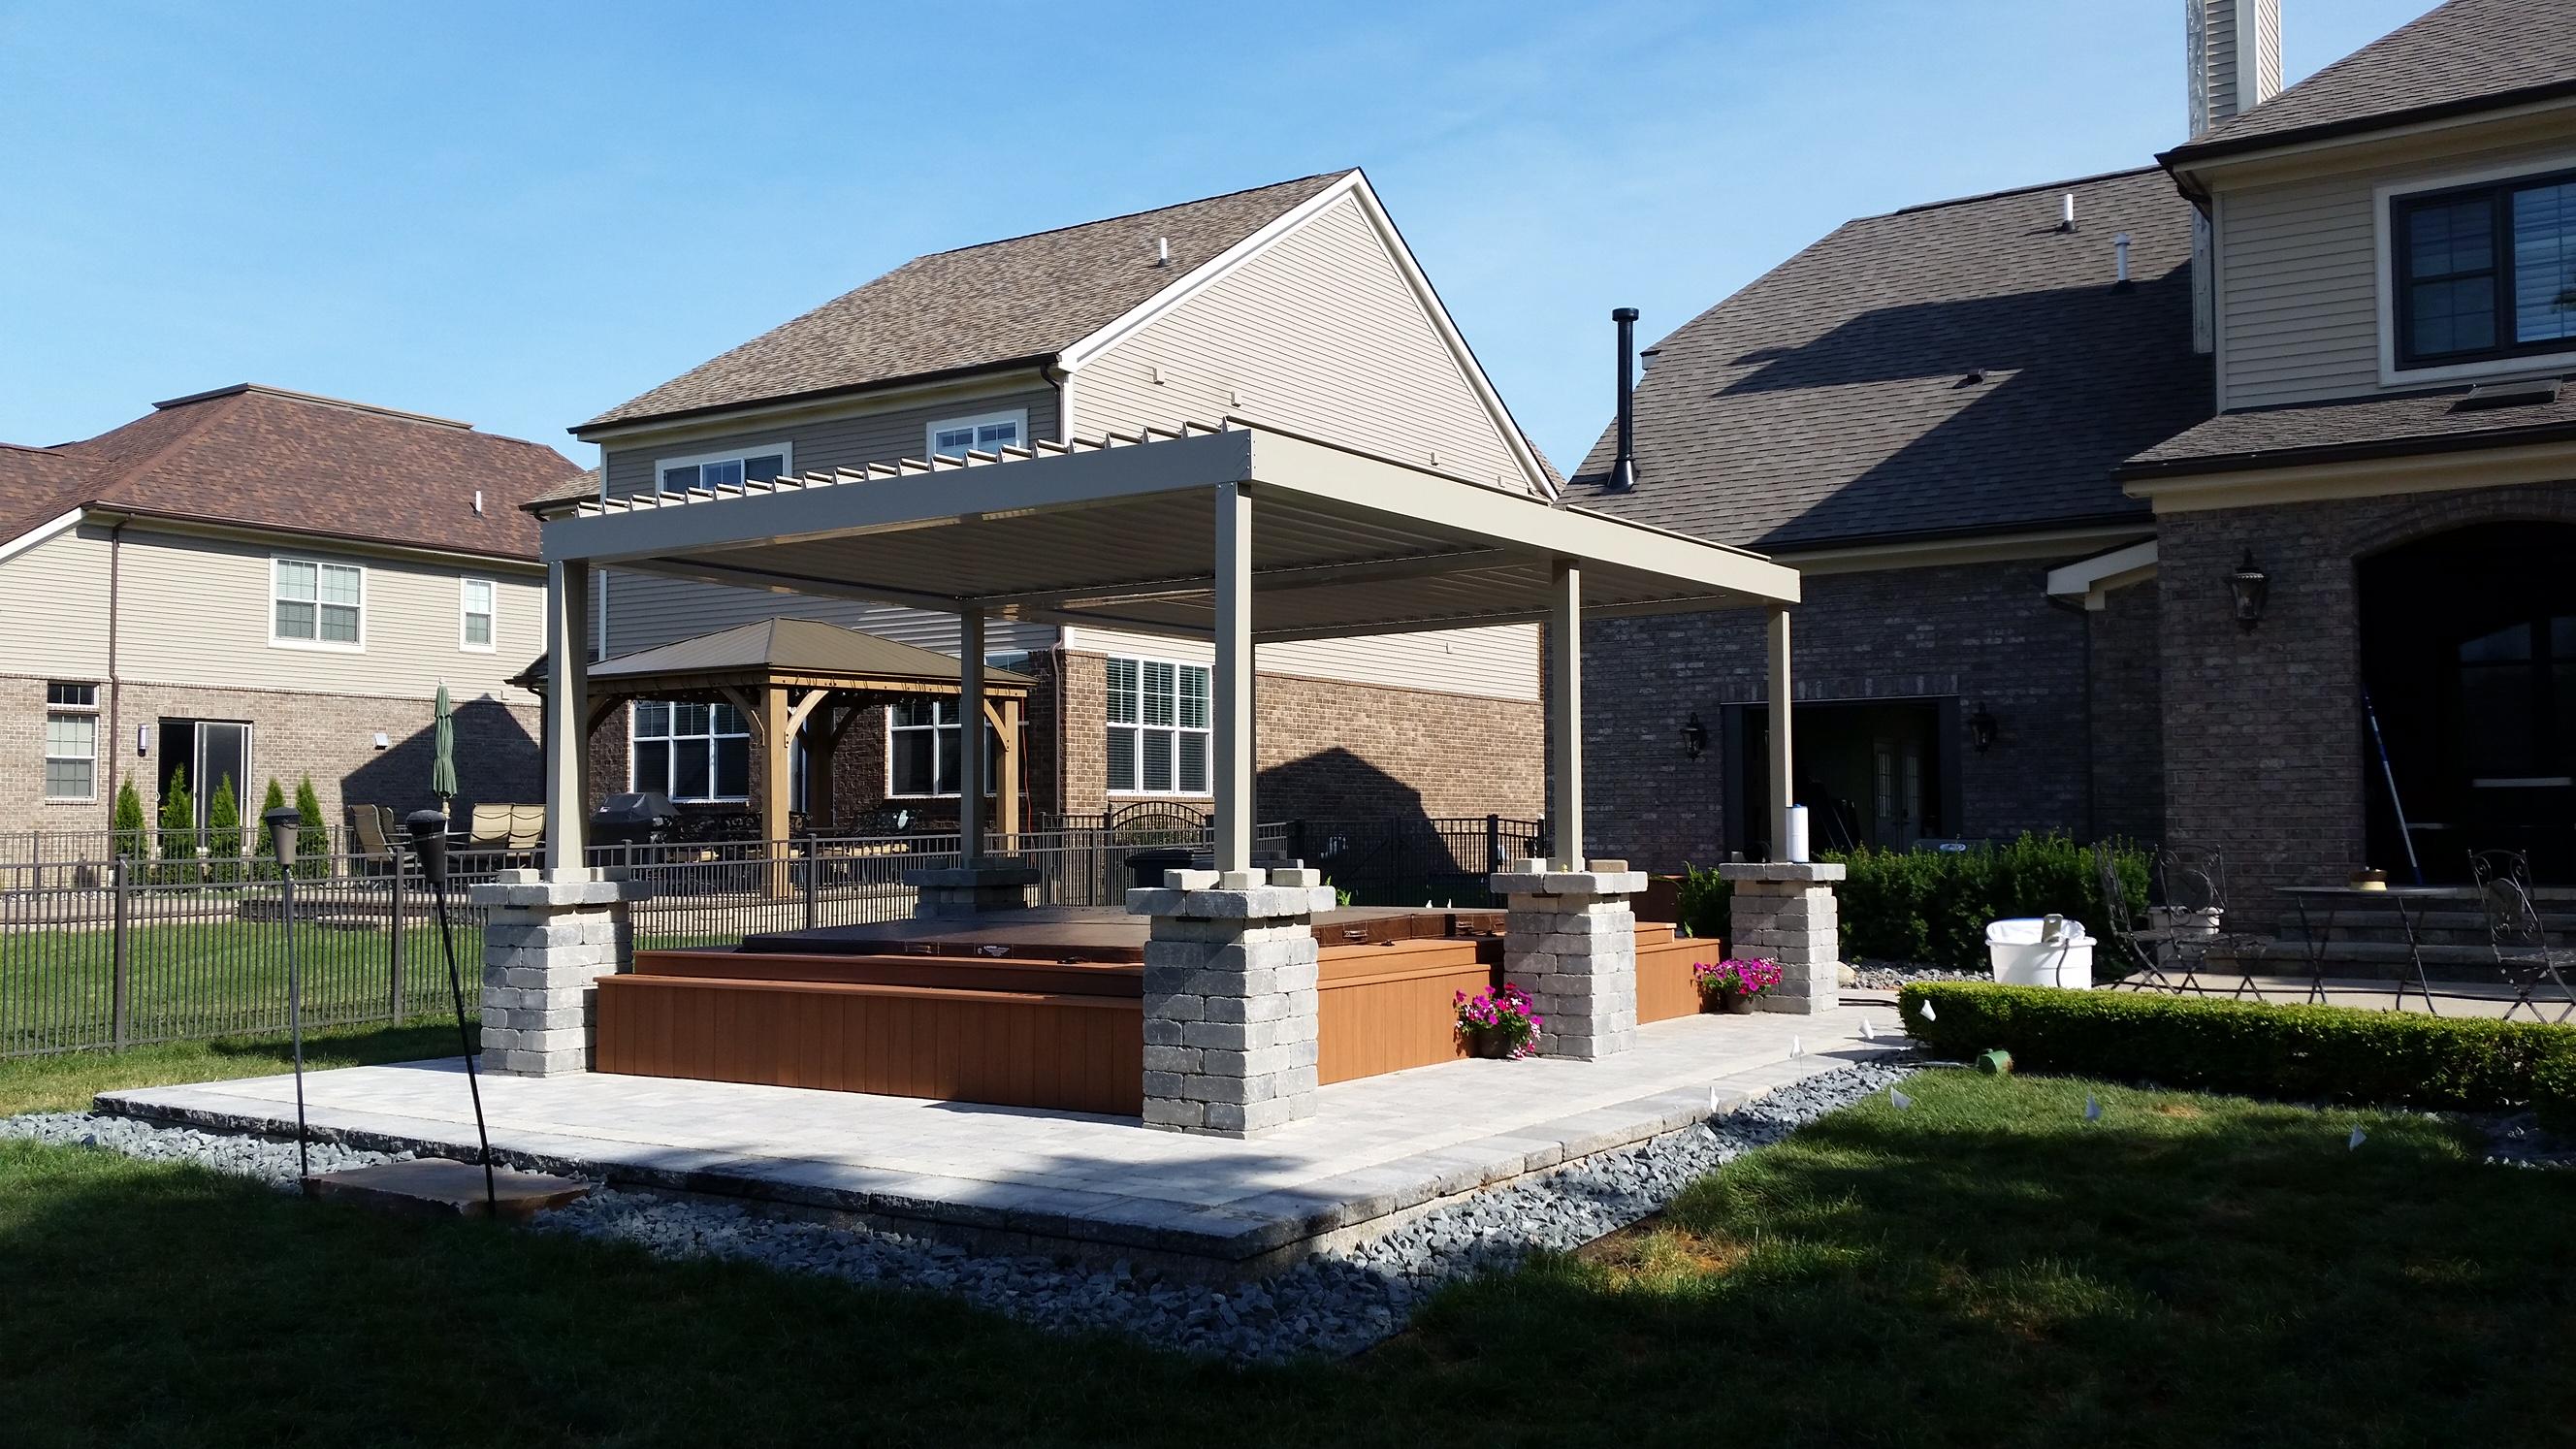 equinox louvered roof gallery mr enclosure michigan sunrooms